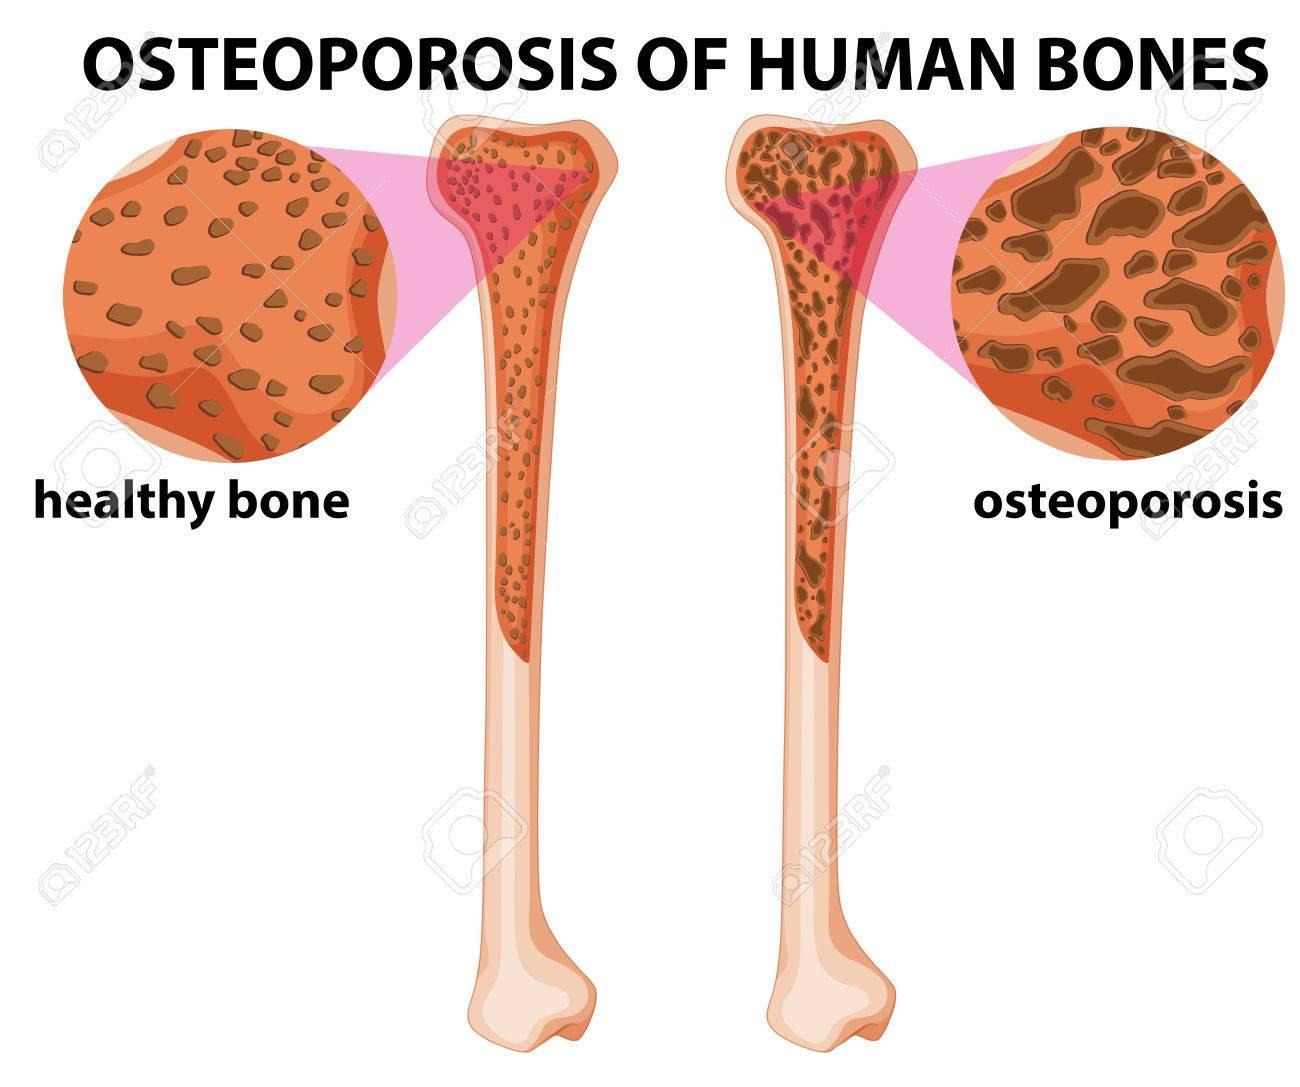 Diagram showing osteoporosis of human bones illustration - 61462448